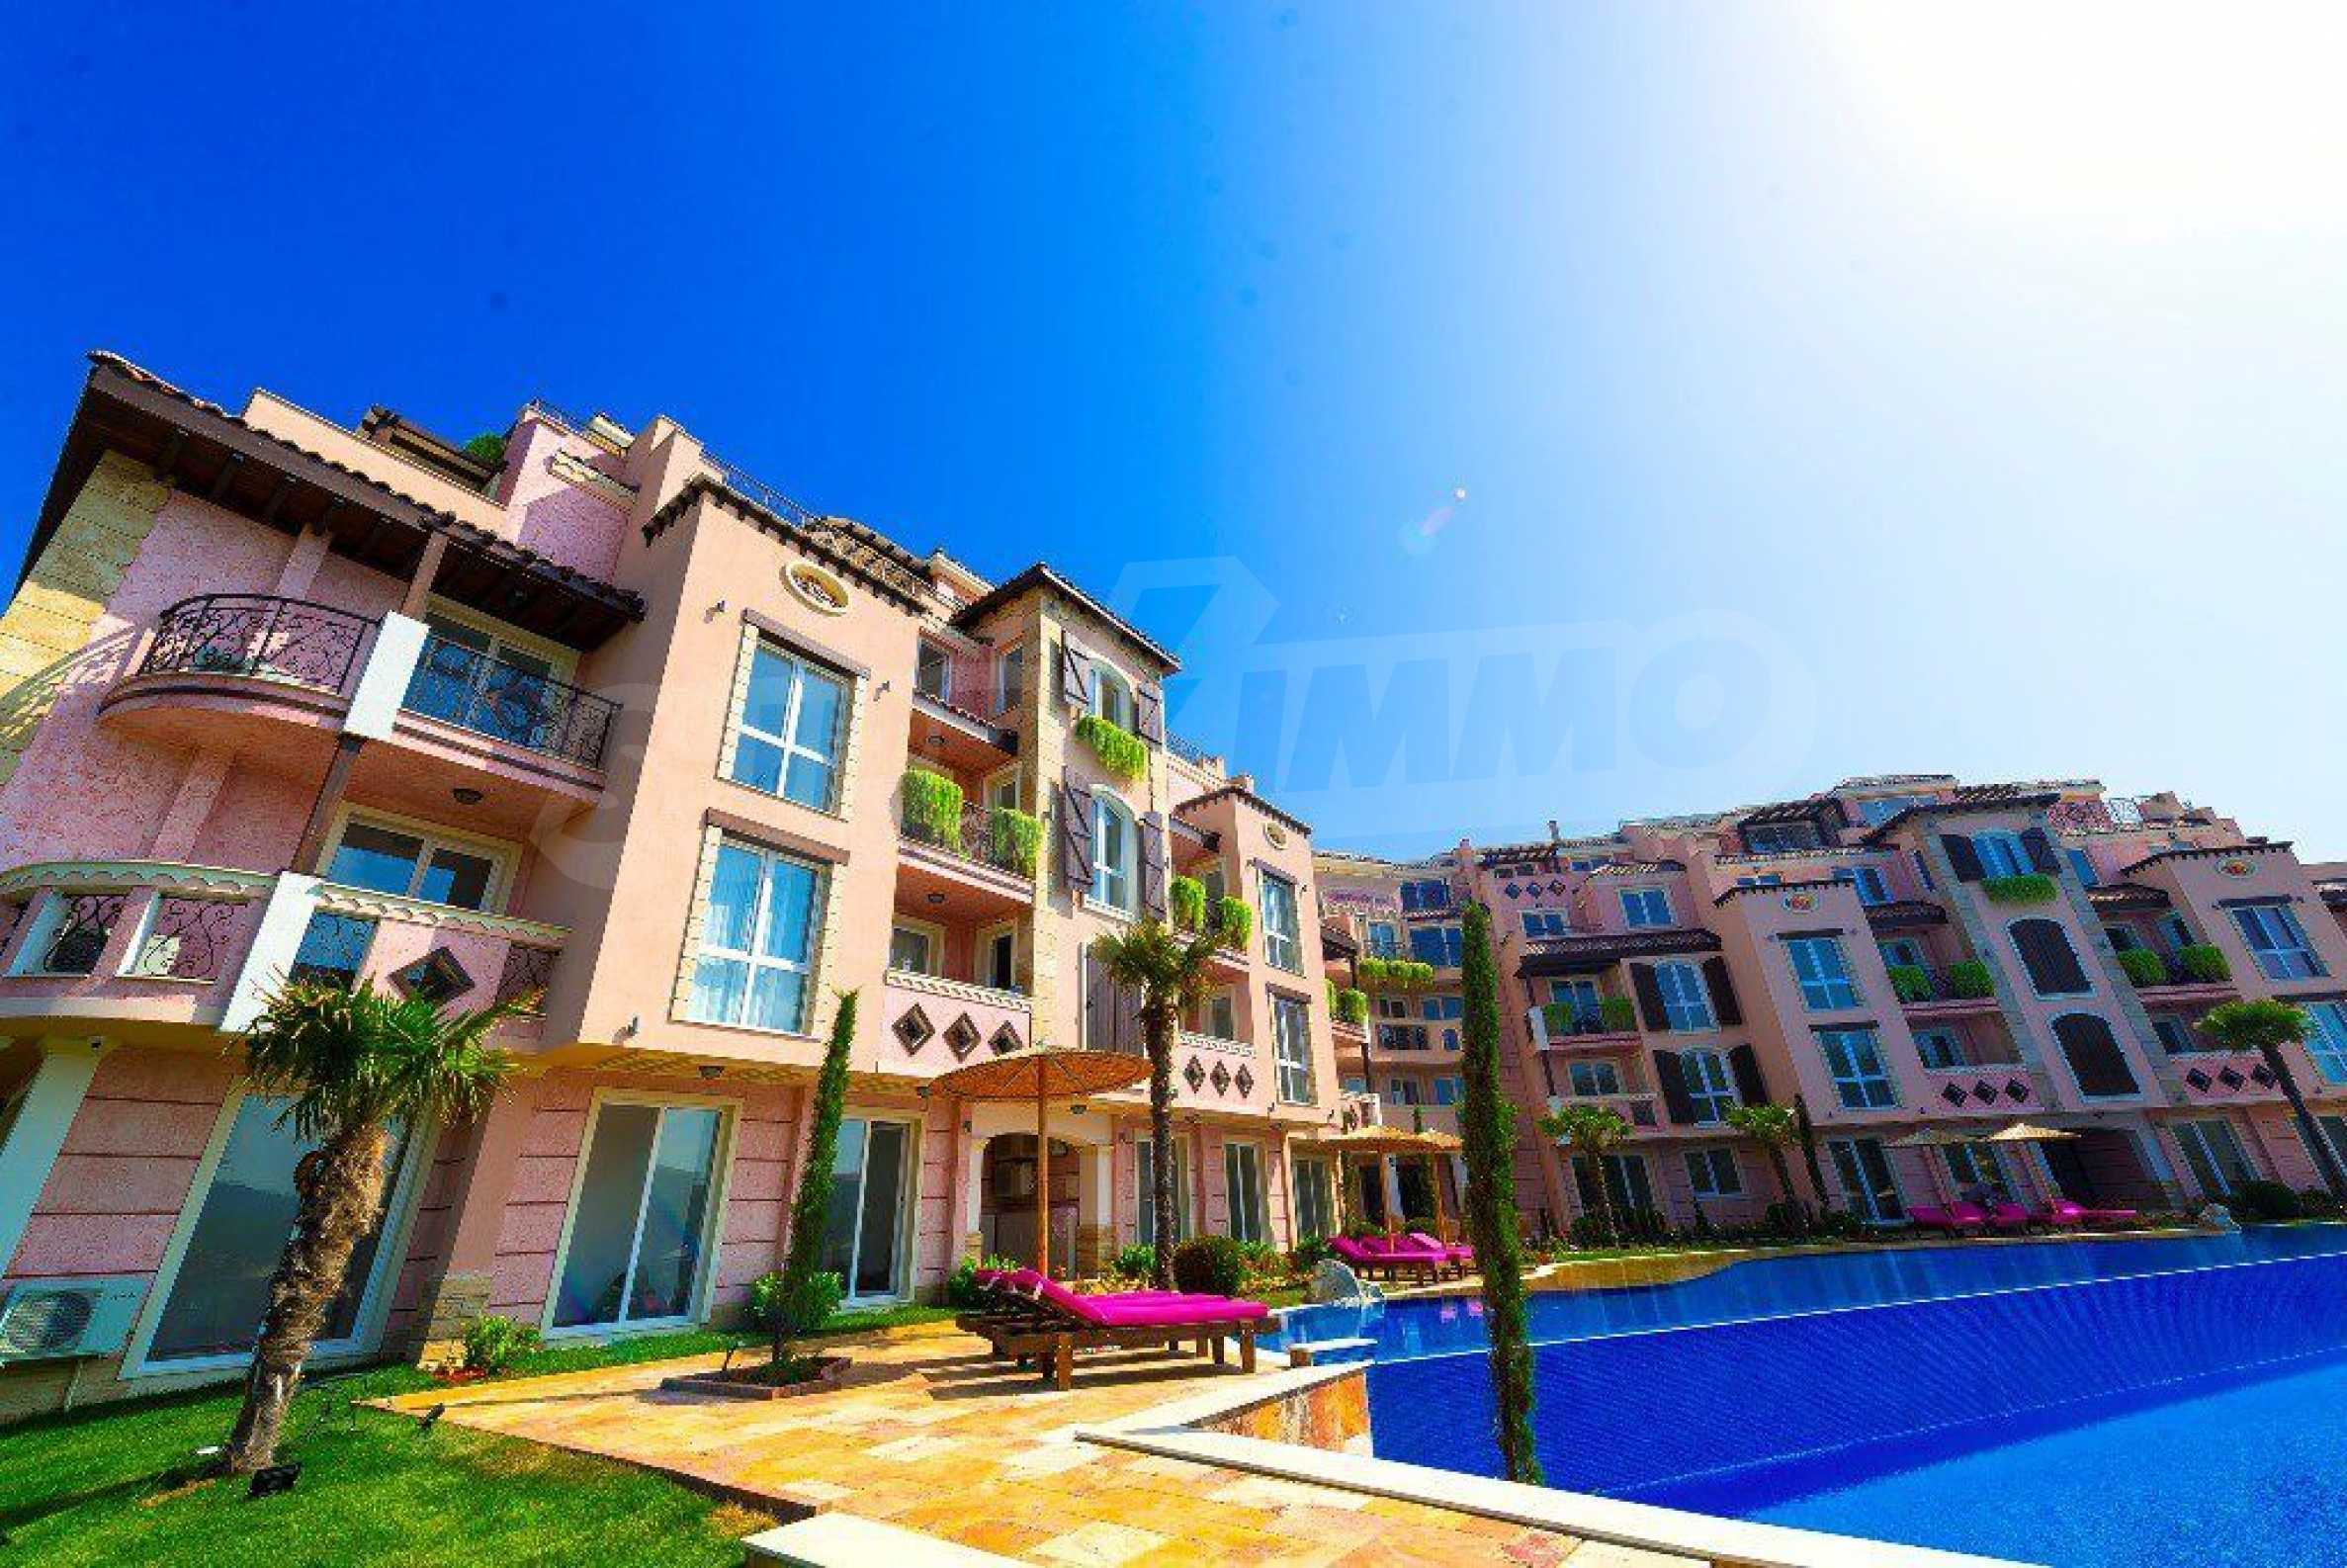 New 1-bedroom apartment in a coastal complex by the Kavatsite Beach (Sozopol) 4